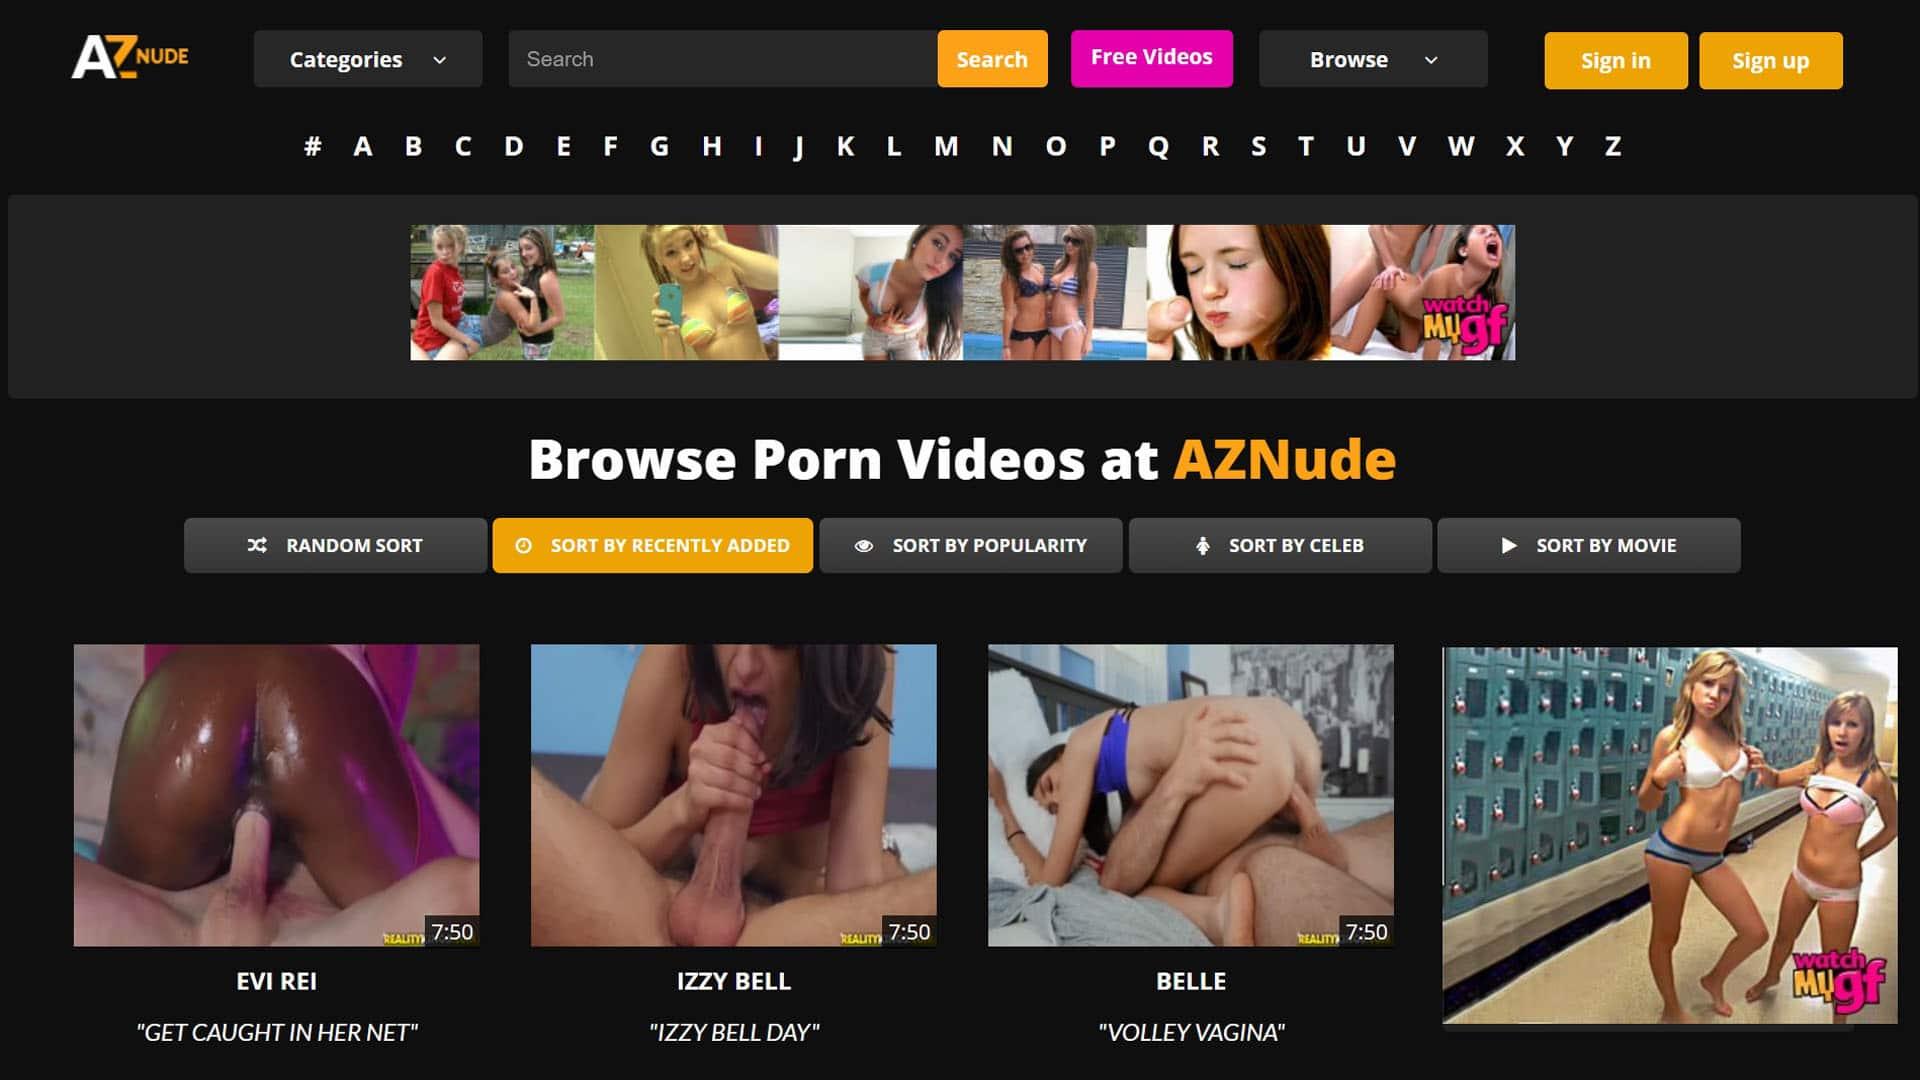 AZNude Recently Added Porn Videos